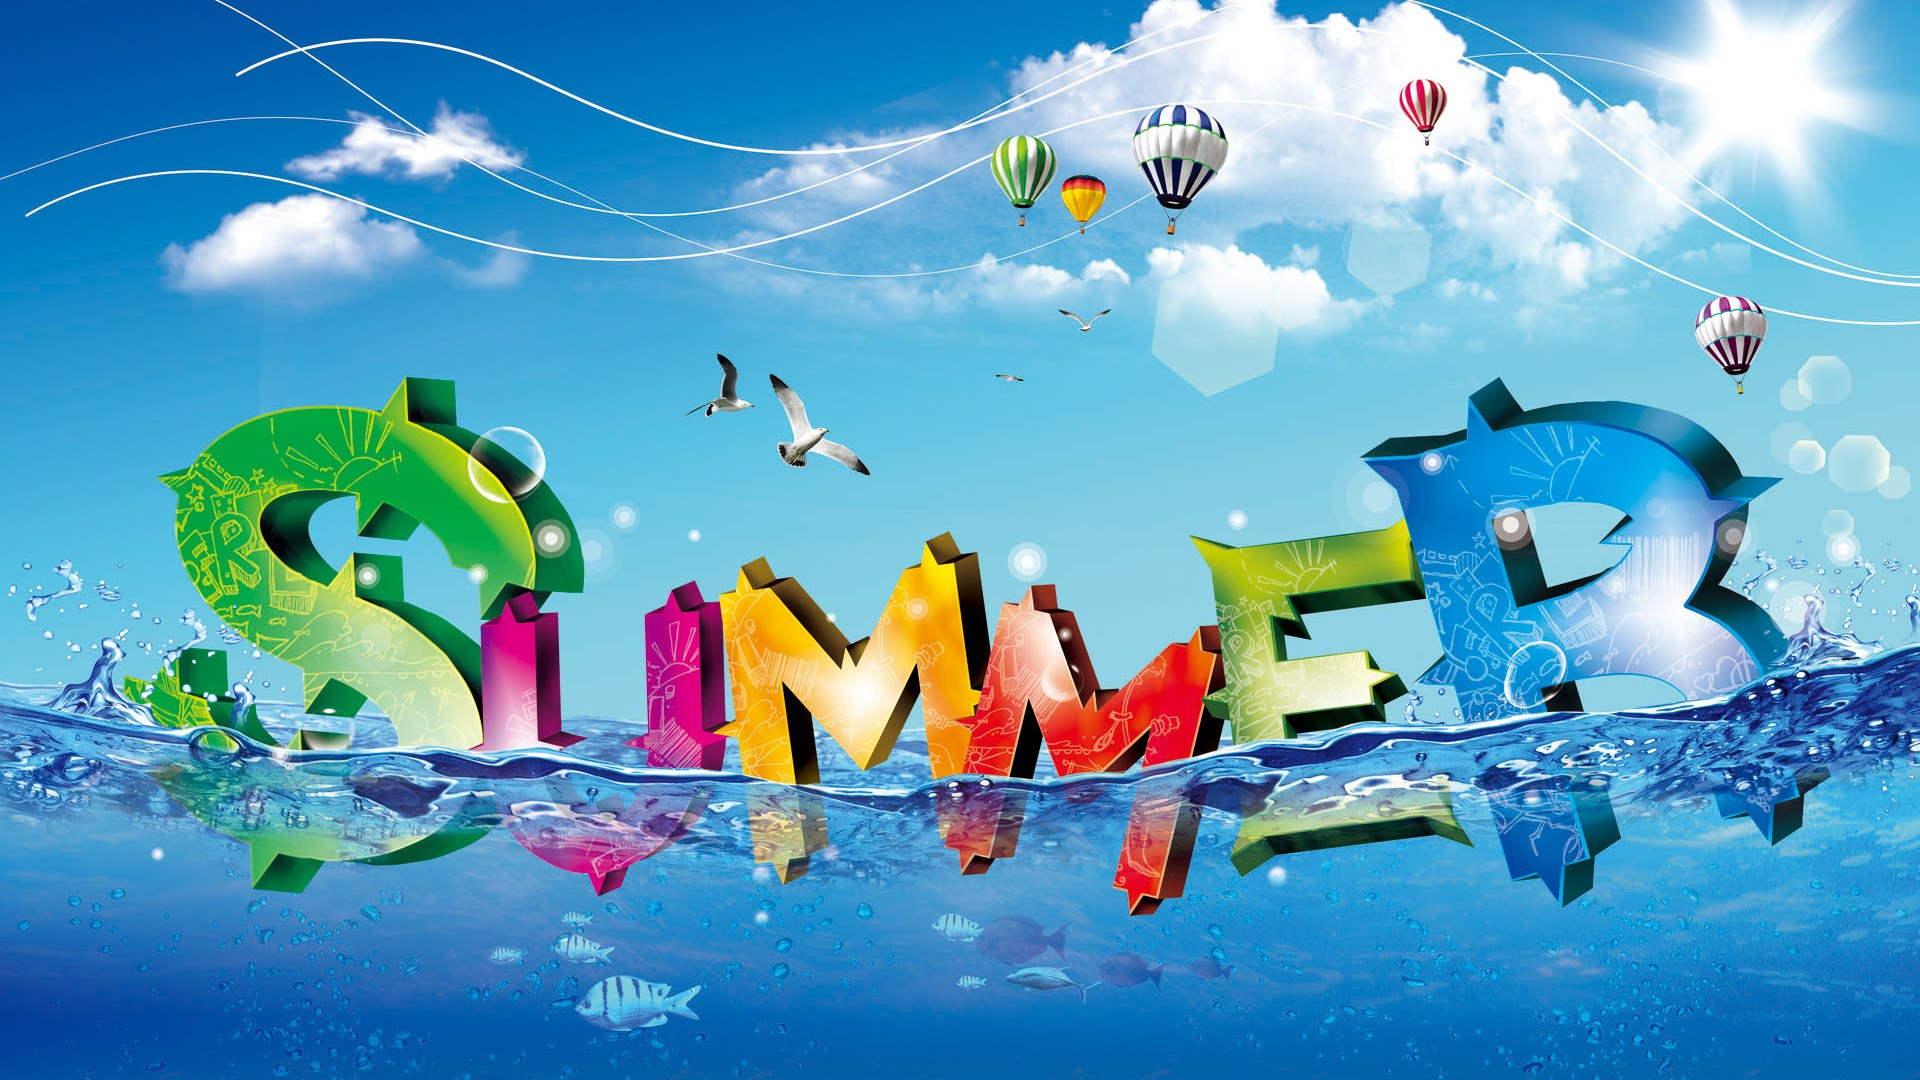 Summer Graphic Design Wallpaper Desktop HD